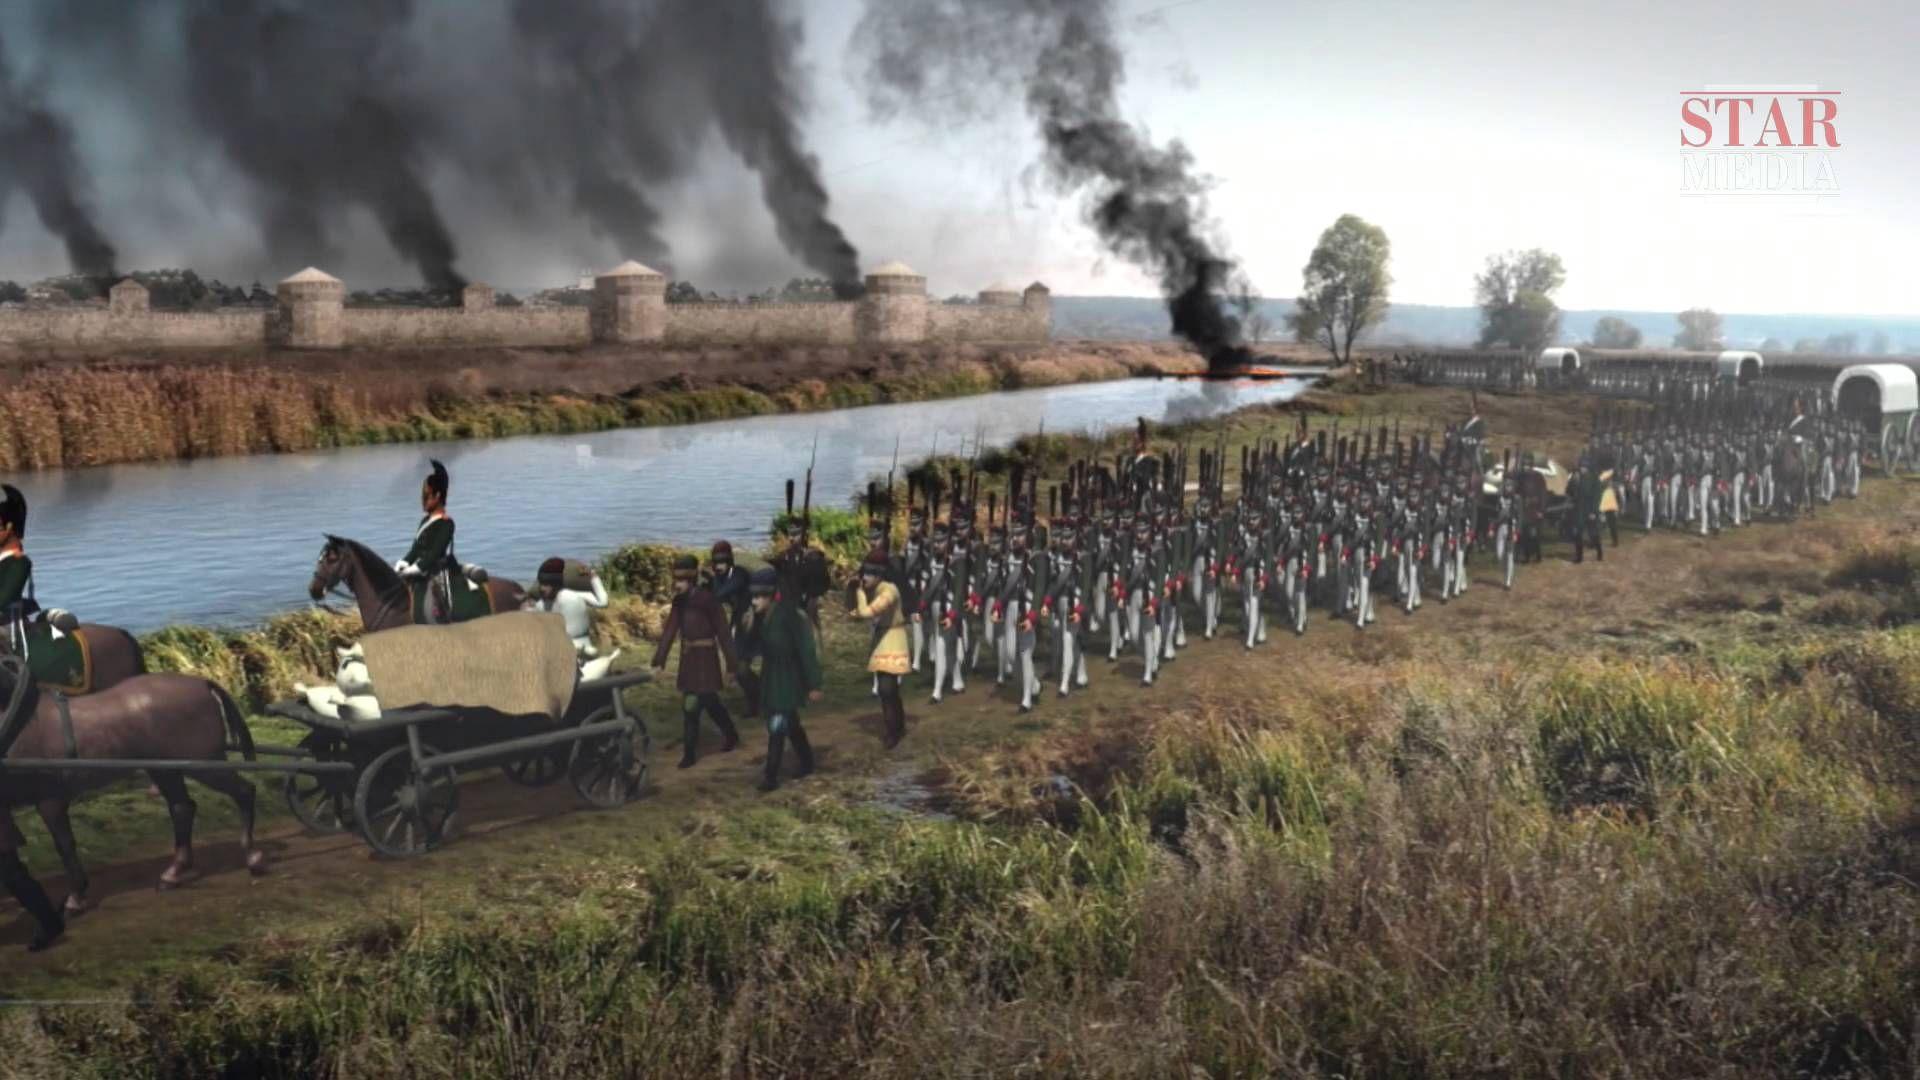 1812 Napoleonic Wars In Russia Episode 2 Documentary Film Starmedia Napoleonic Wars Documentaries Documentary Film